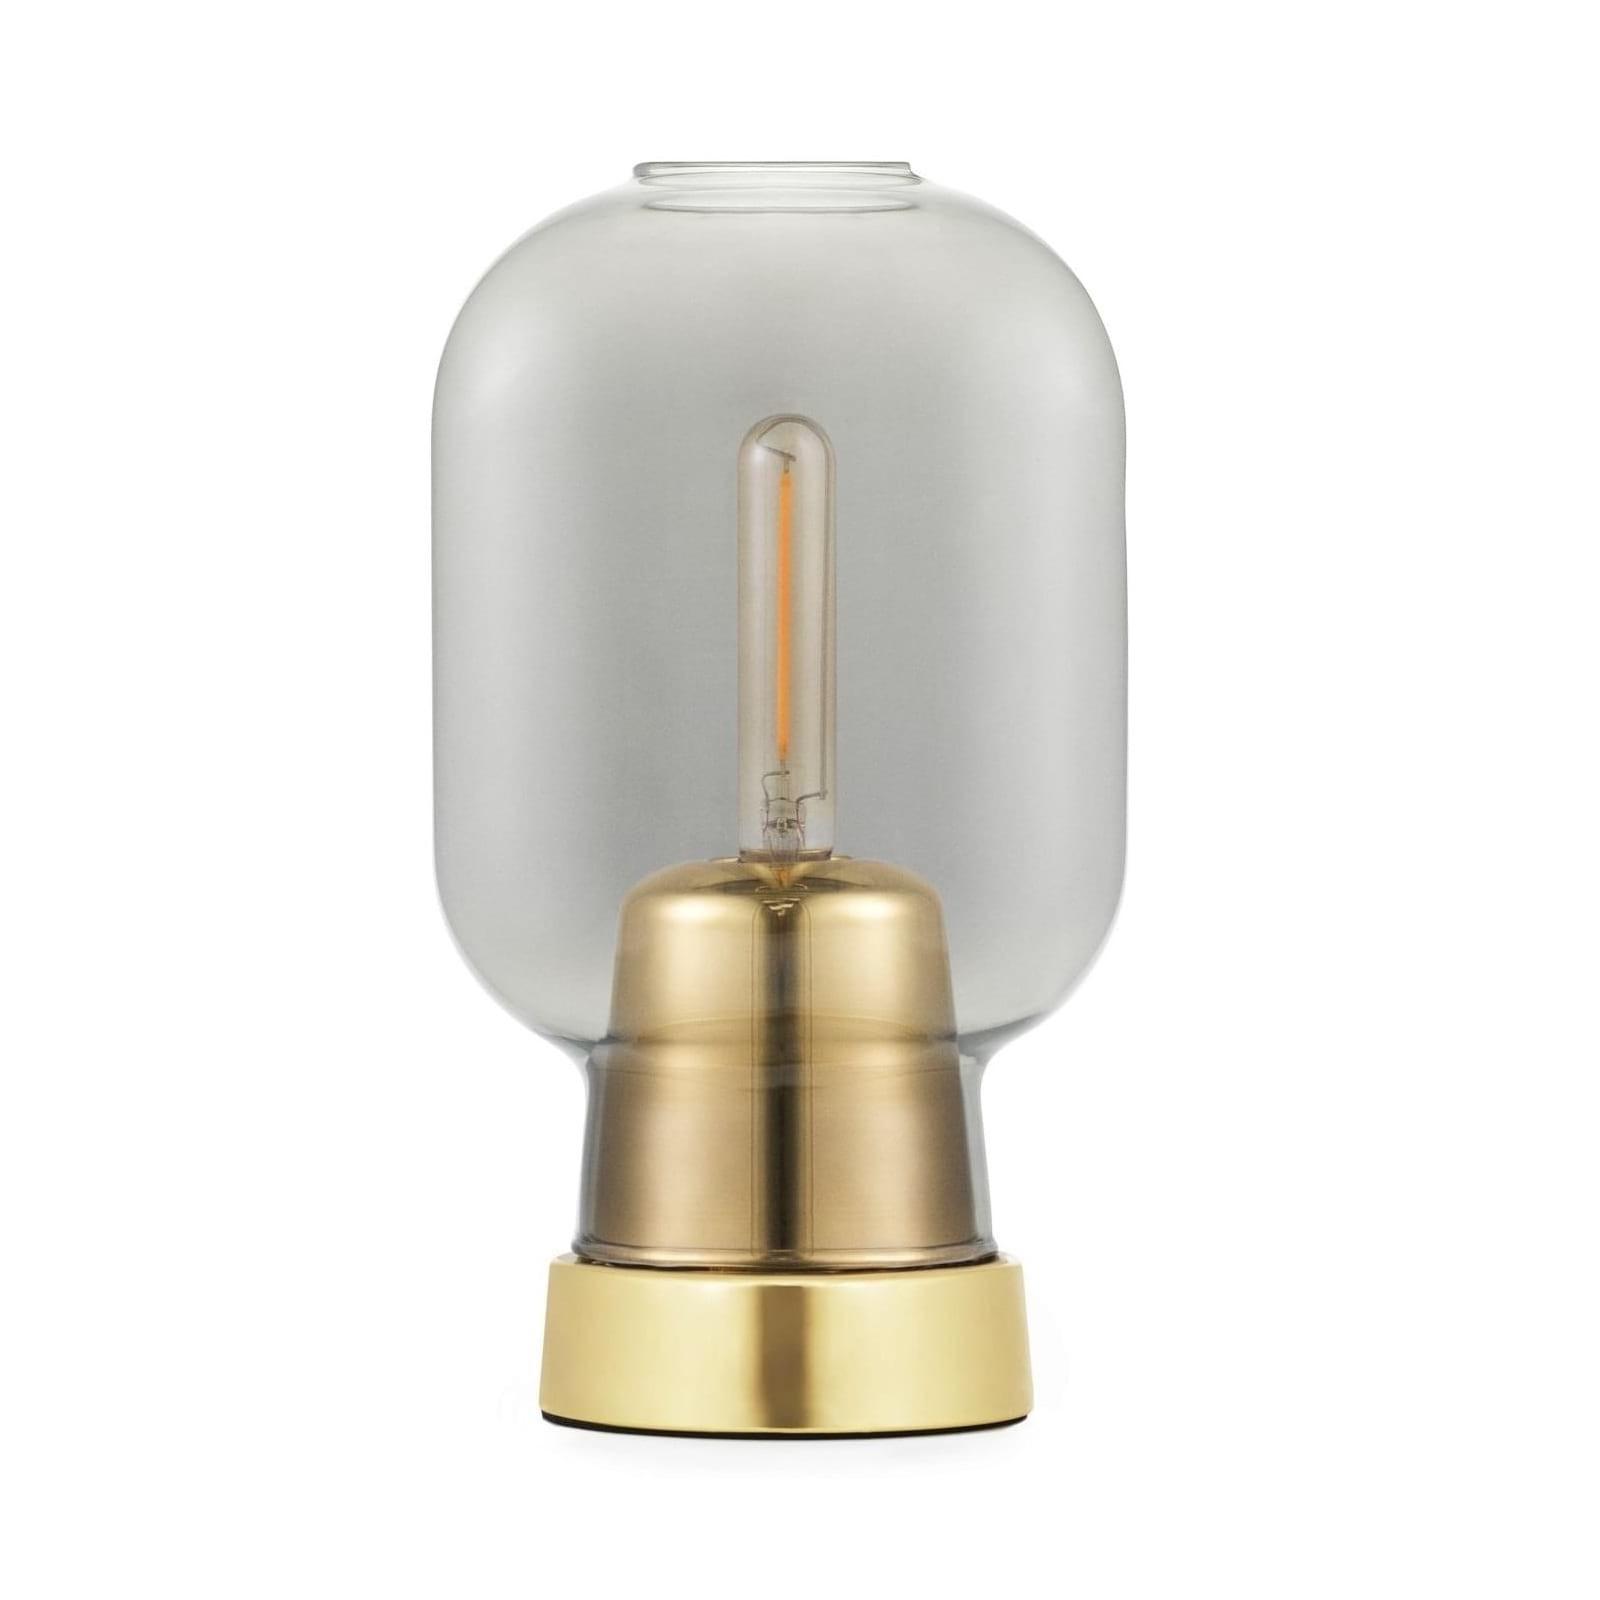 Amp Table Lamp (Smoke / Brass) - Normann Copenhagen